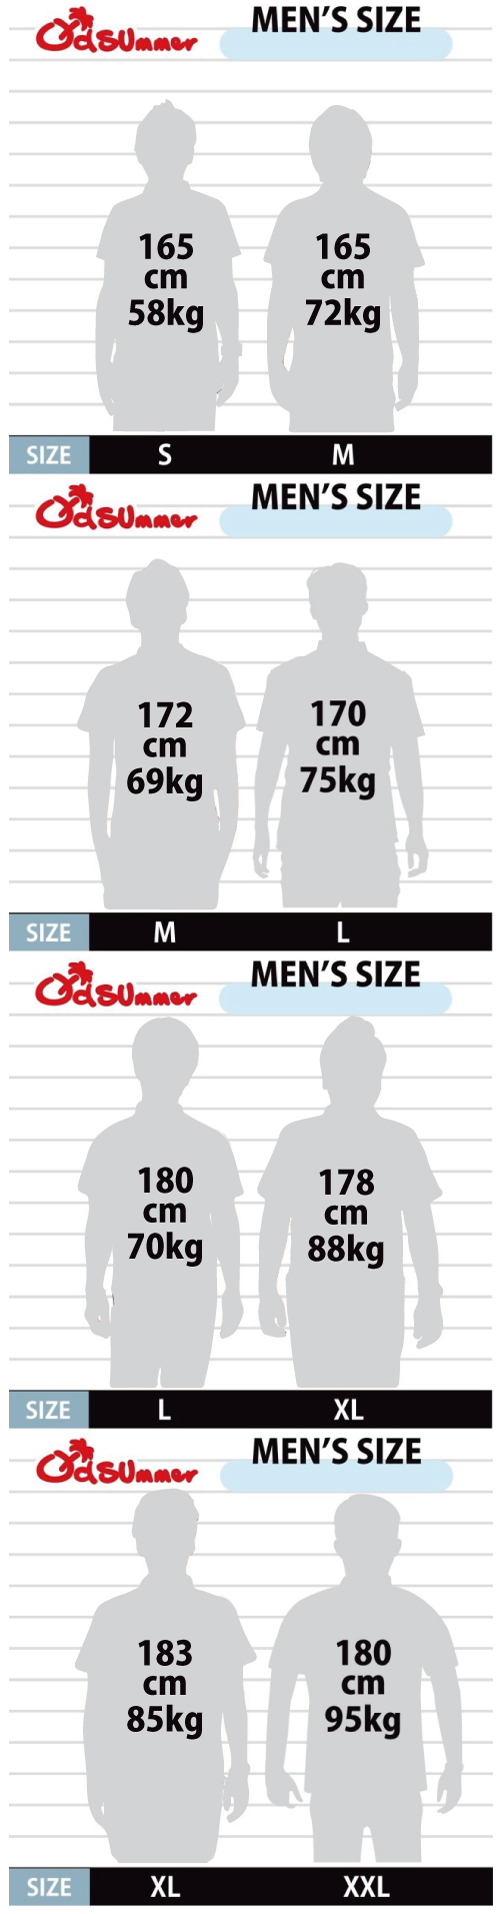 Tシャツサイズ目安表